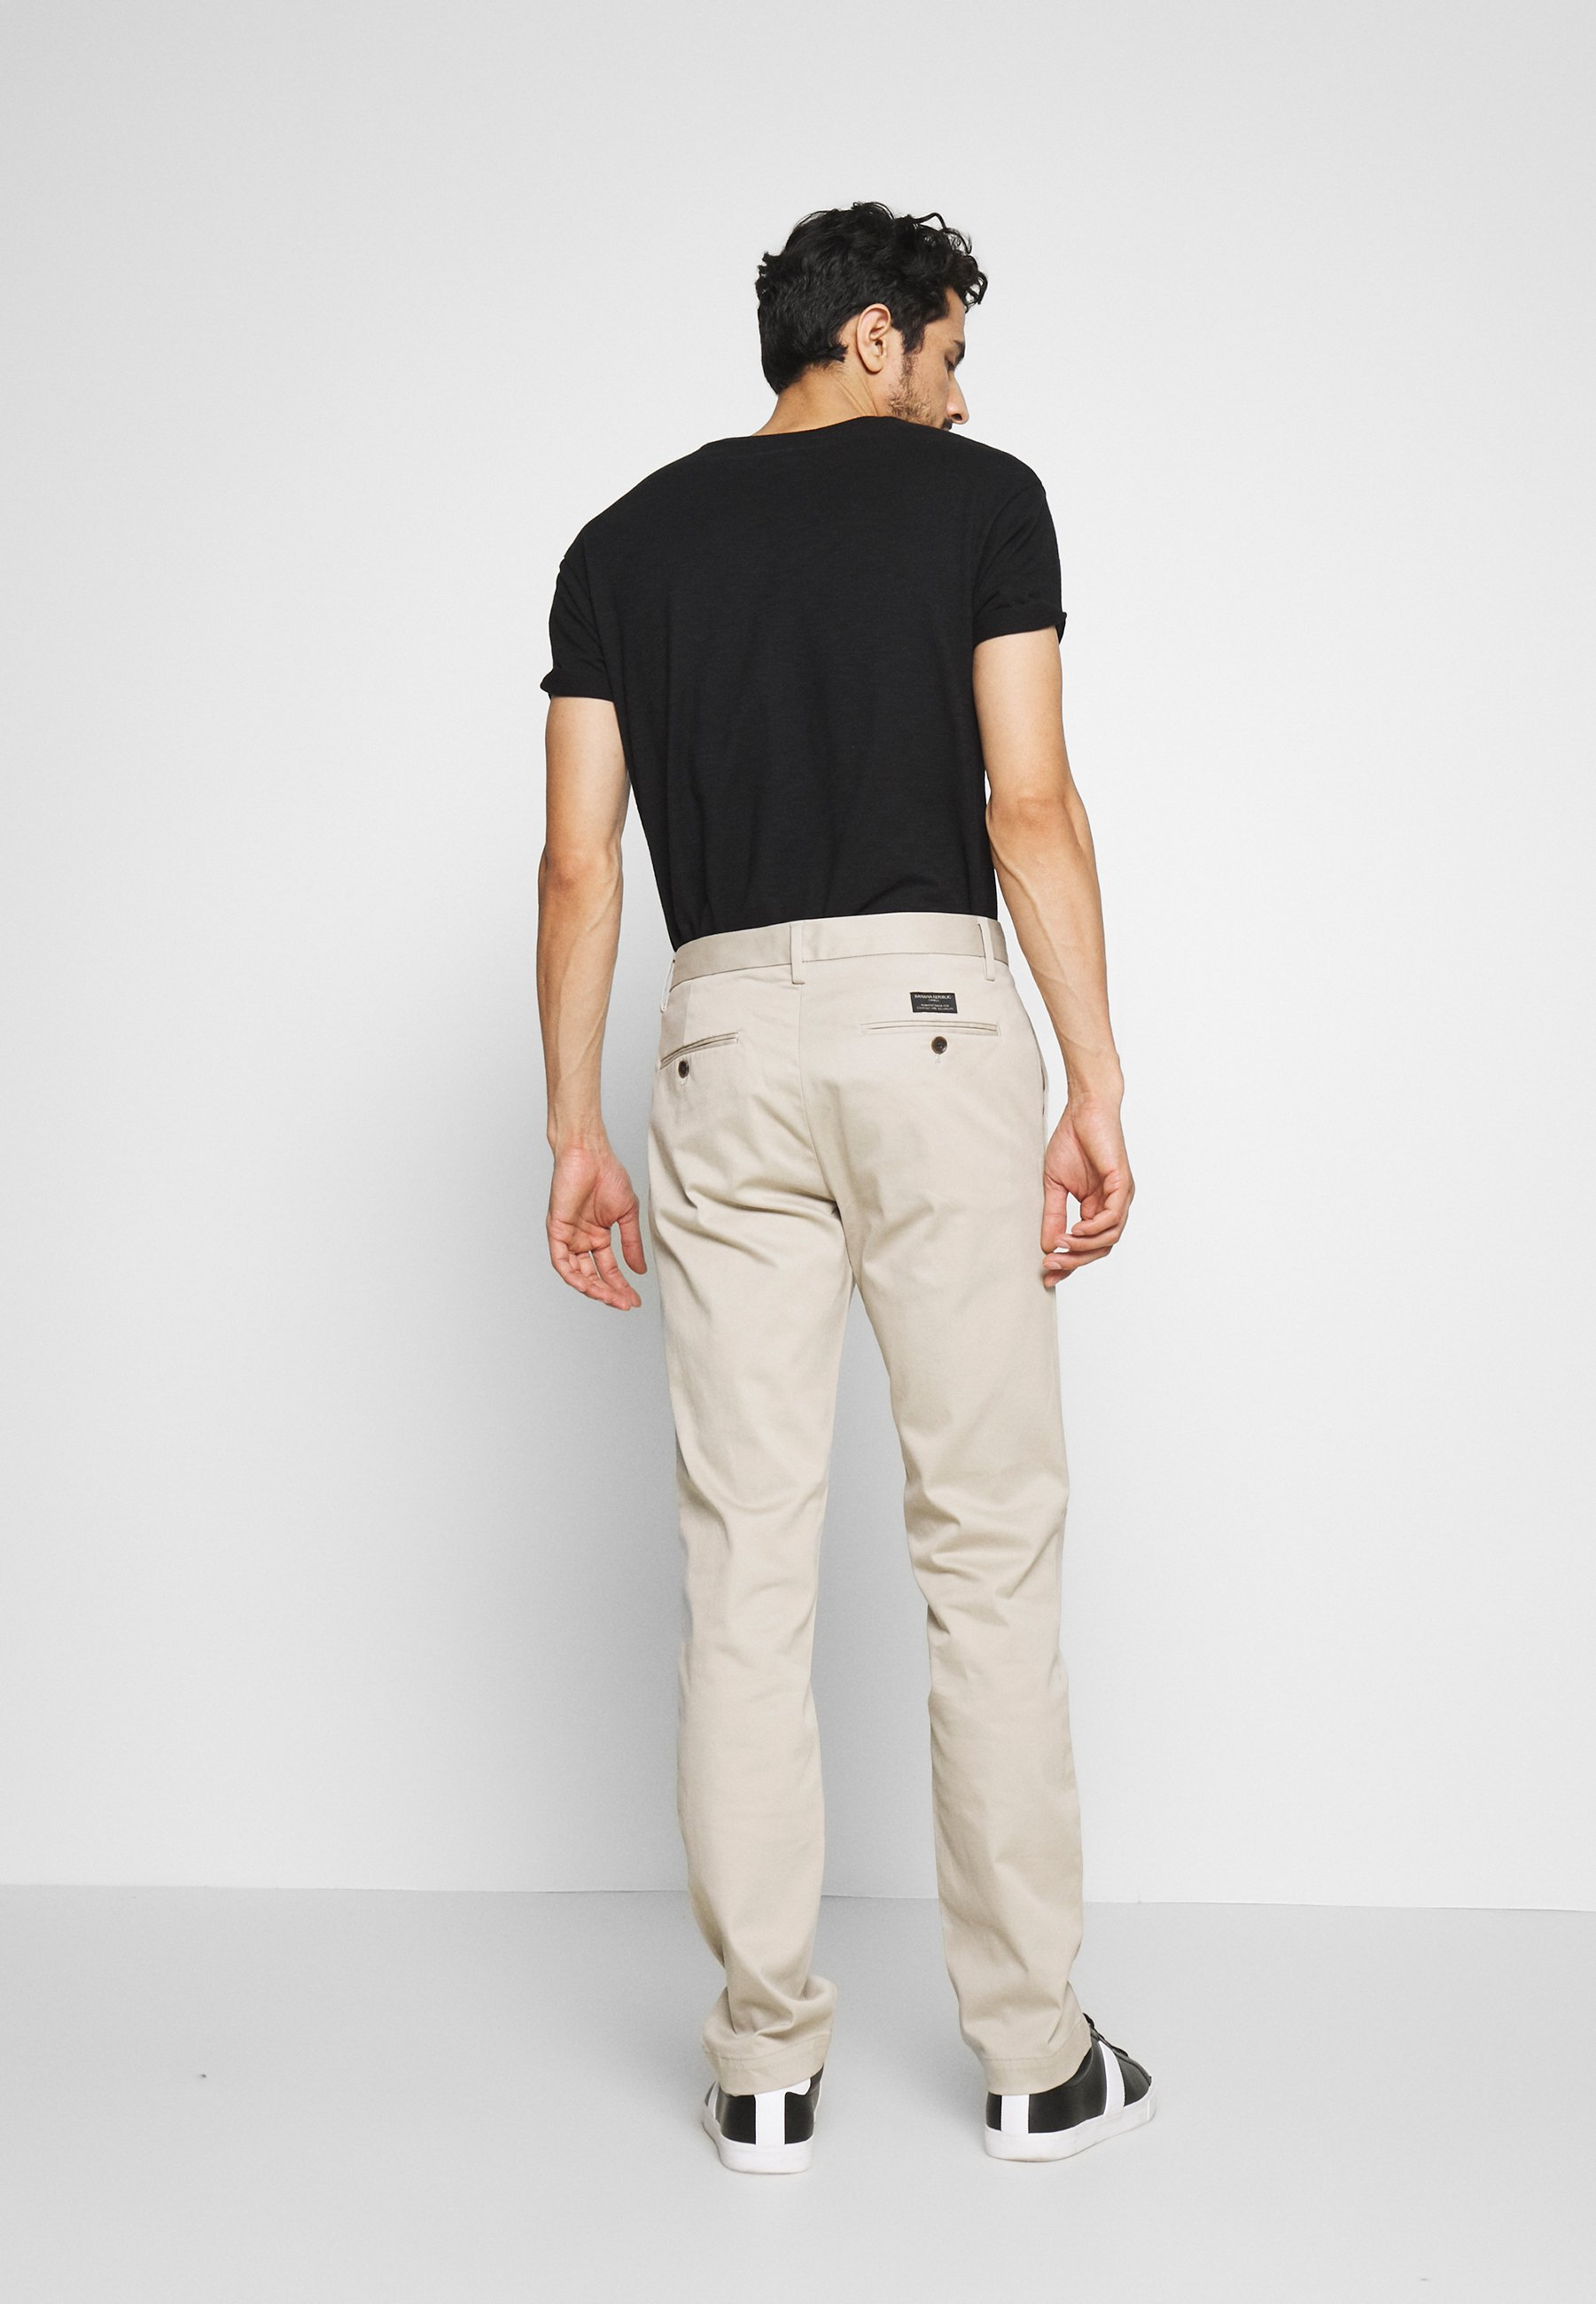 Banana Republic Fulton - Pantaloni Sandbar Beige unfiEm1